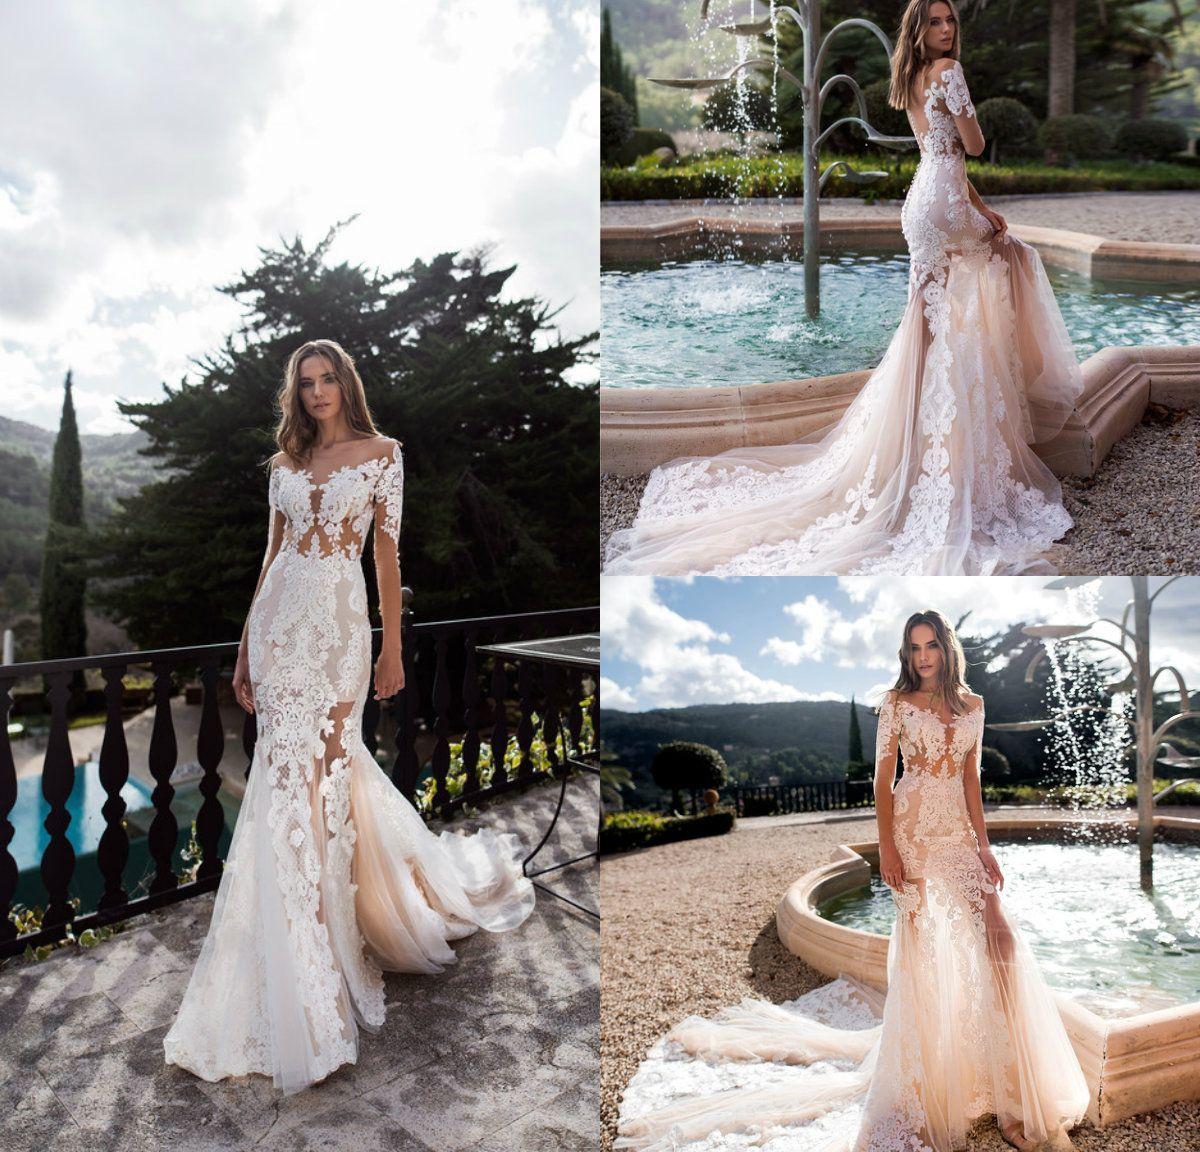 Full Lace Mermaid Wedding Dresses Sheer Jewel Neck Sweep Train Long Sleeve Wedding Dress Tulle Custom Made Illusion Sexy Bridal Gowns